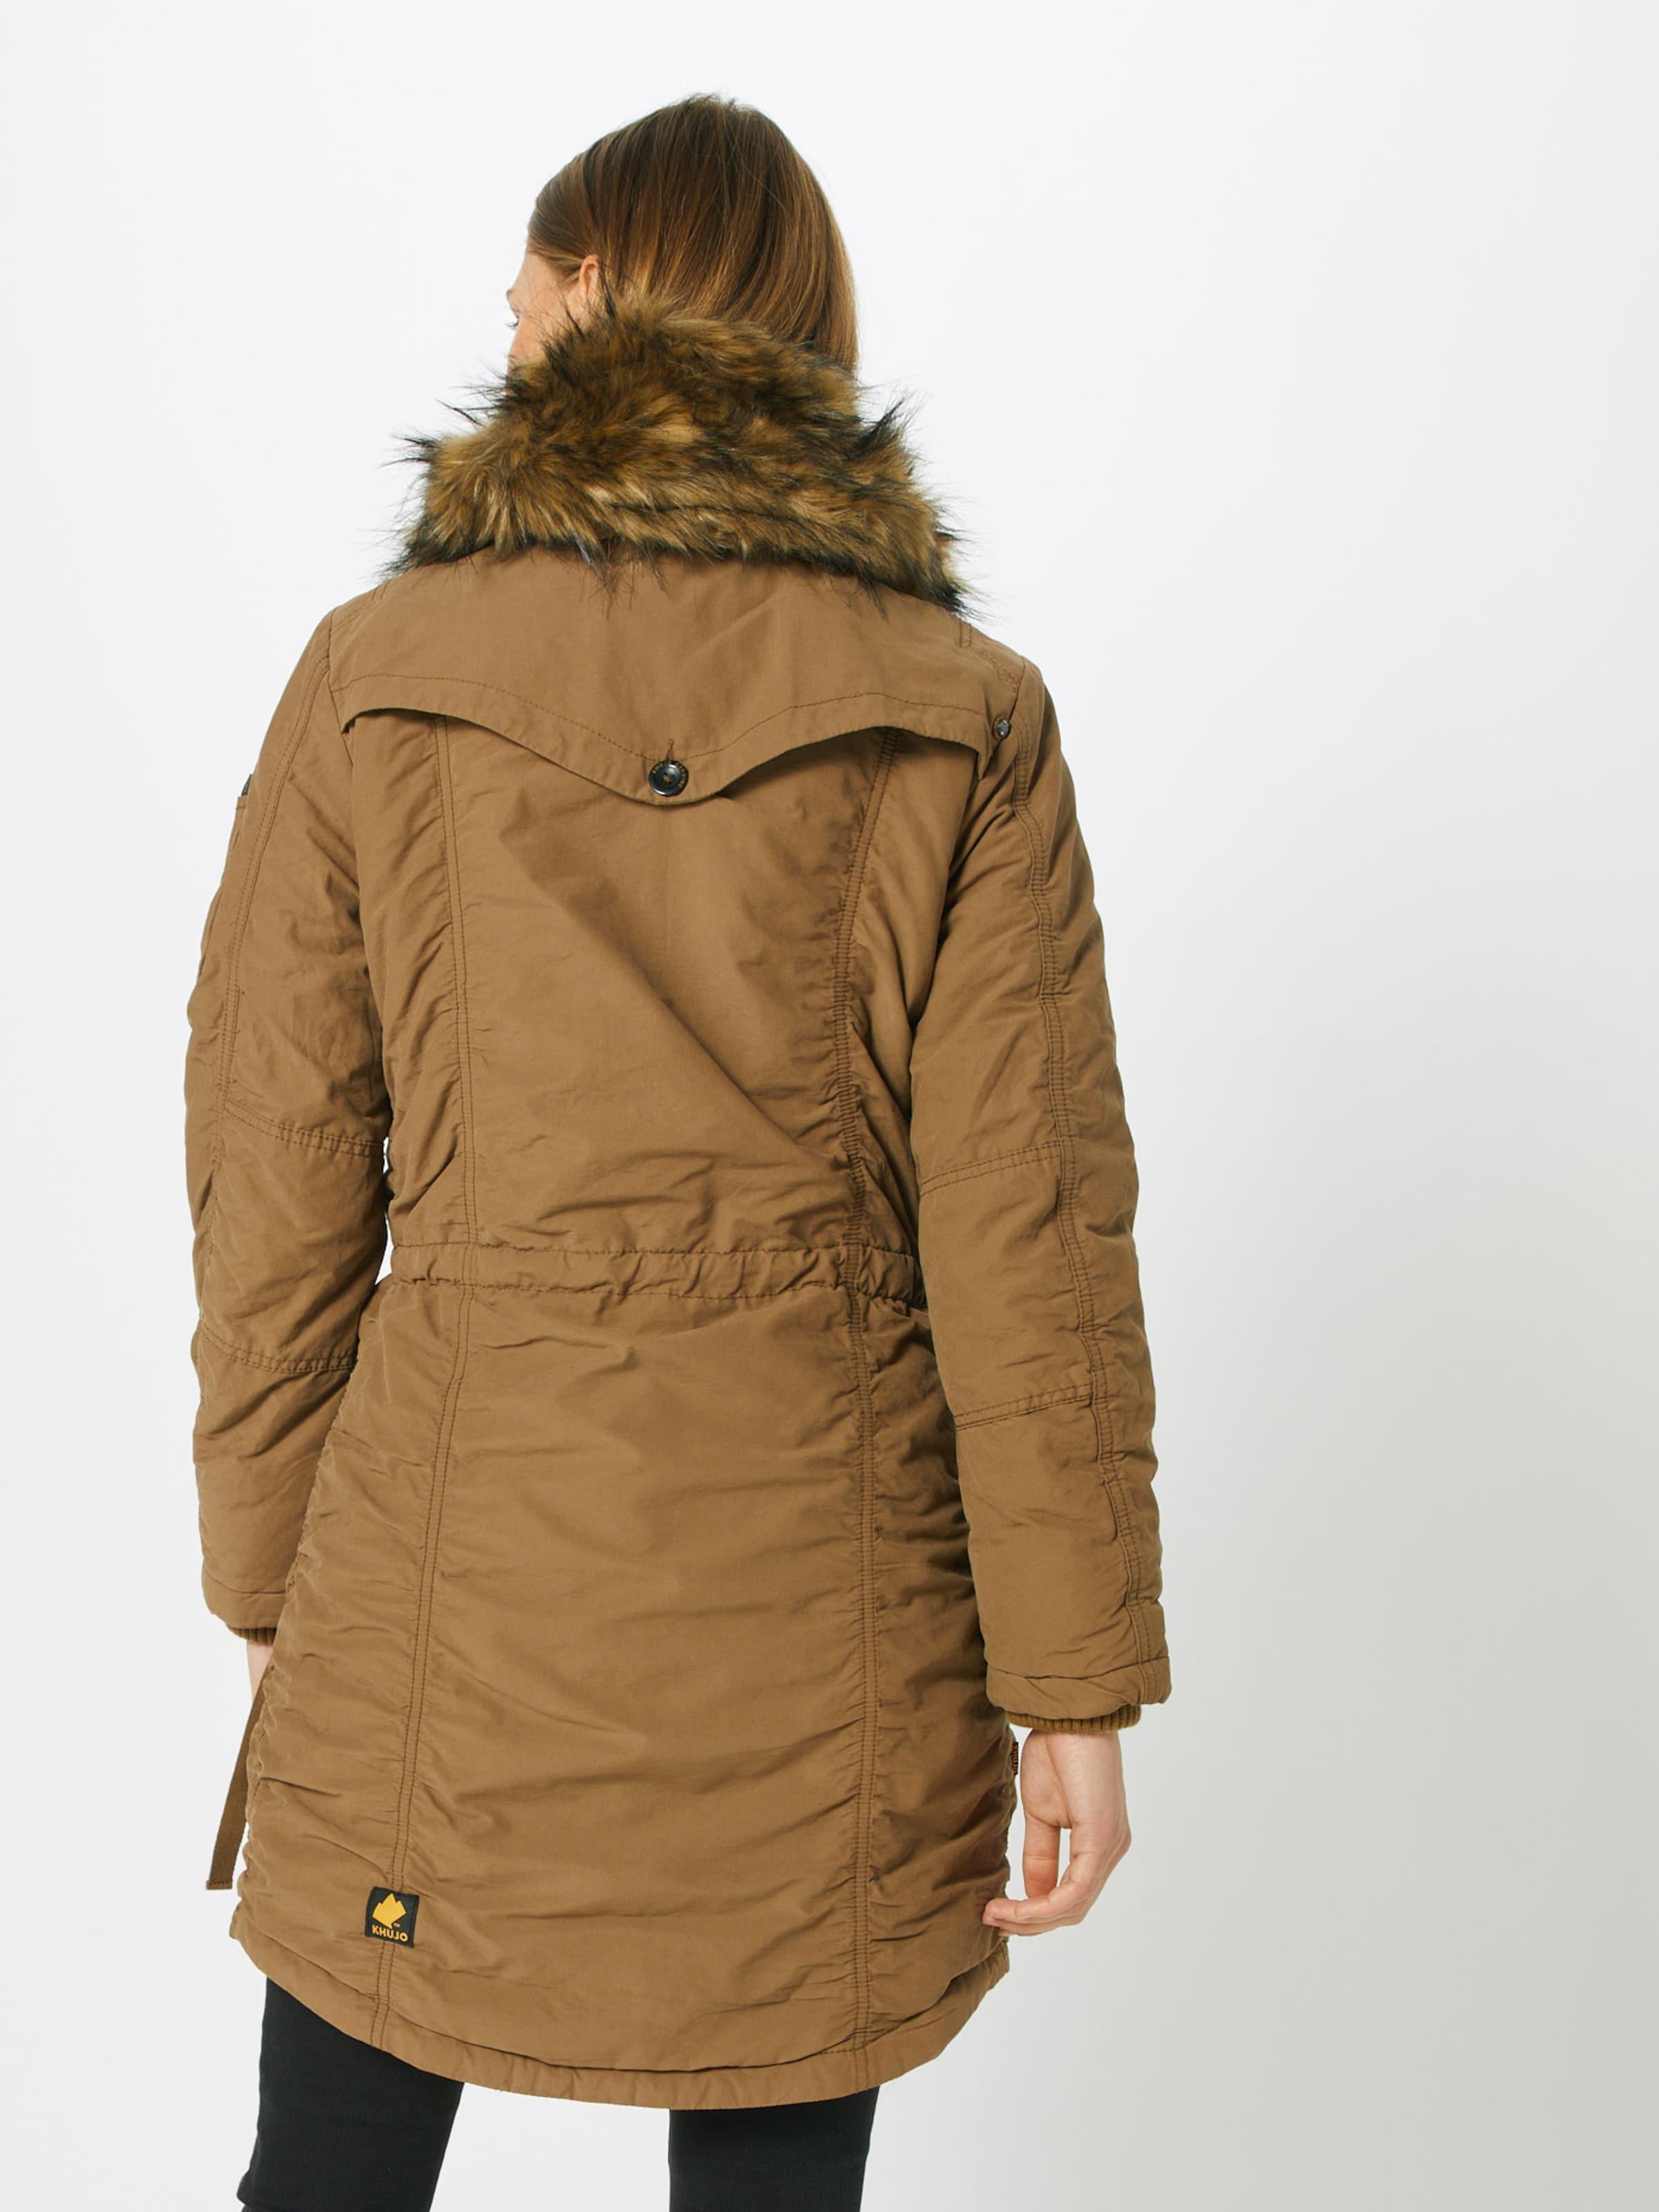 'stefania' Miel Khujo D'hiver Manteau En BedWCrox